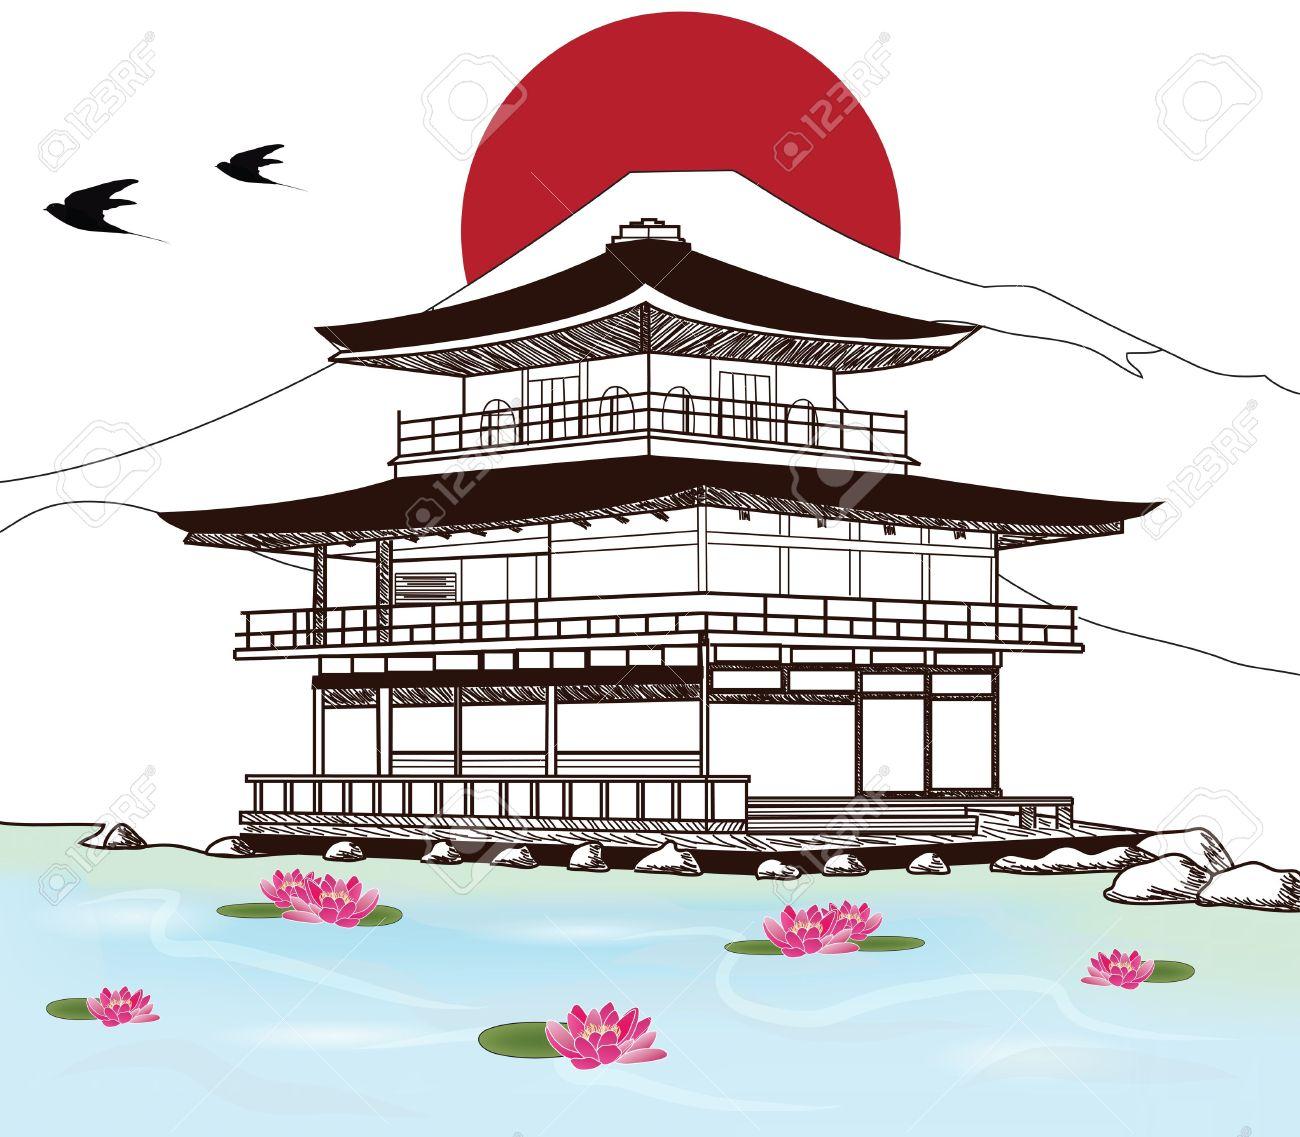 Sketch Of A Beautiful Japanese Pagoda Royalty Free Cliparts.